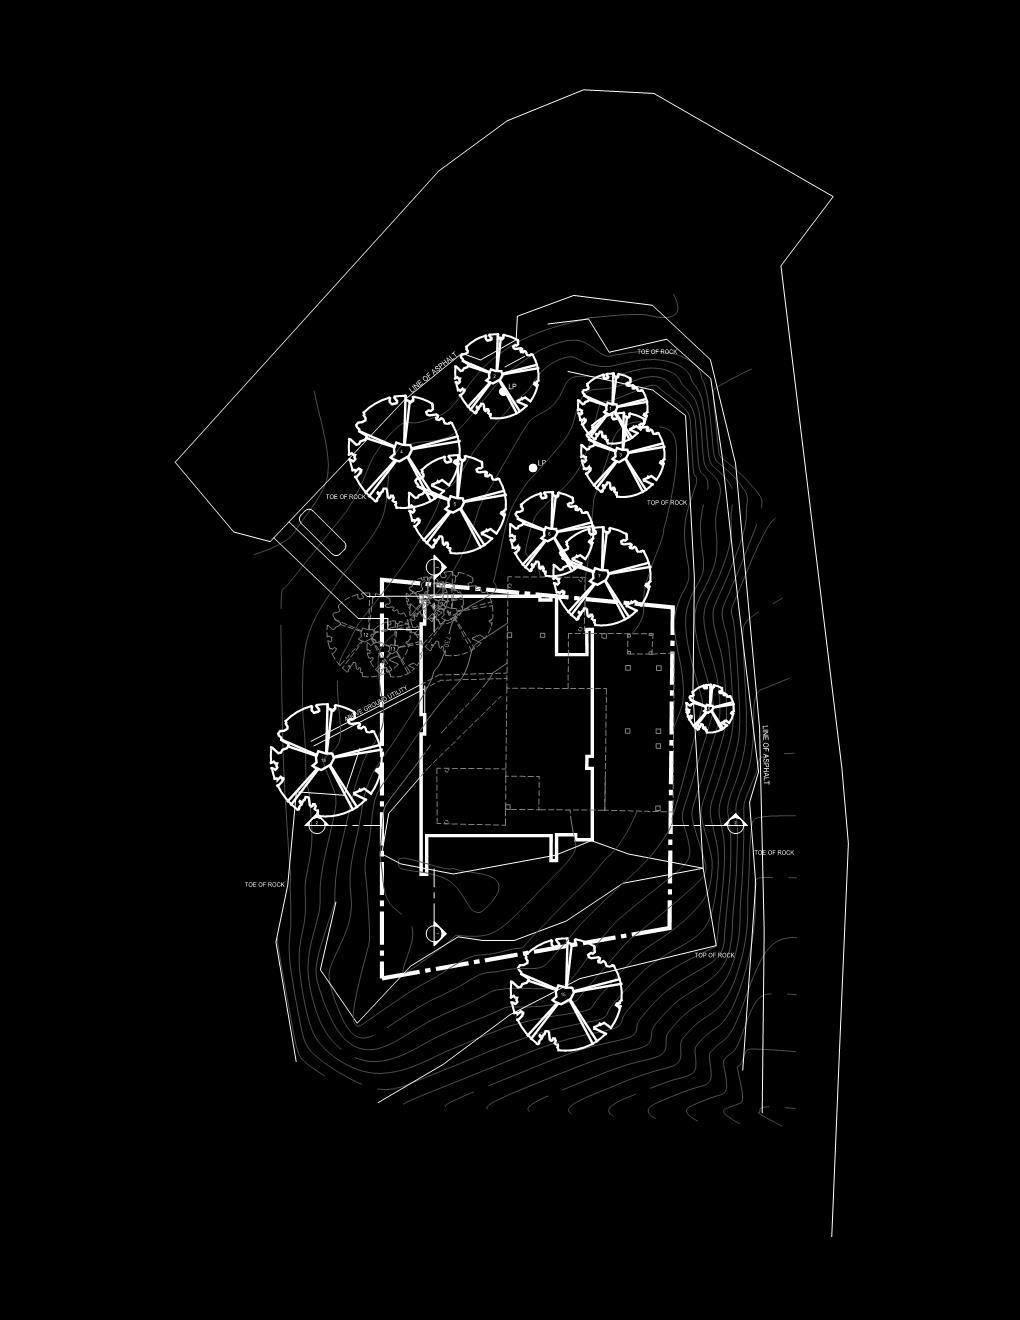 McKinley Burkart_Whistler_Site Plan_inverted.jpg